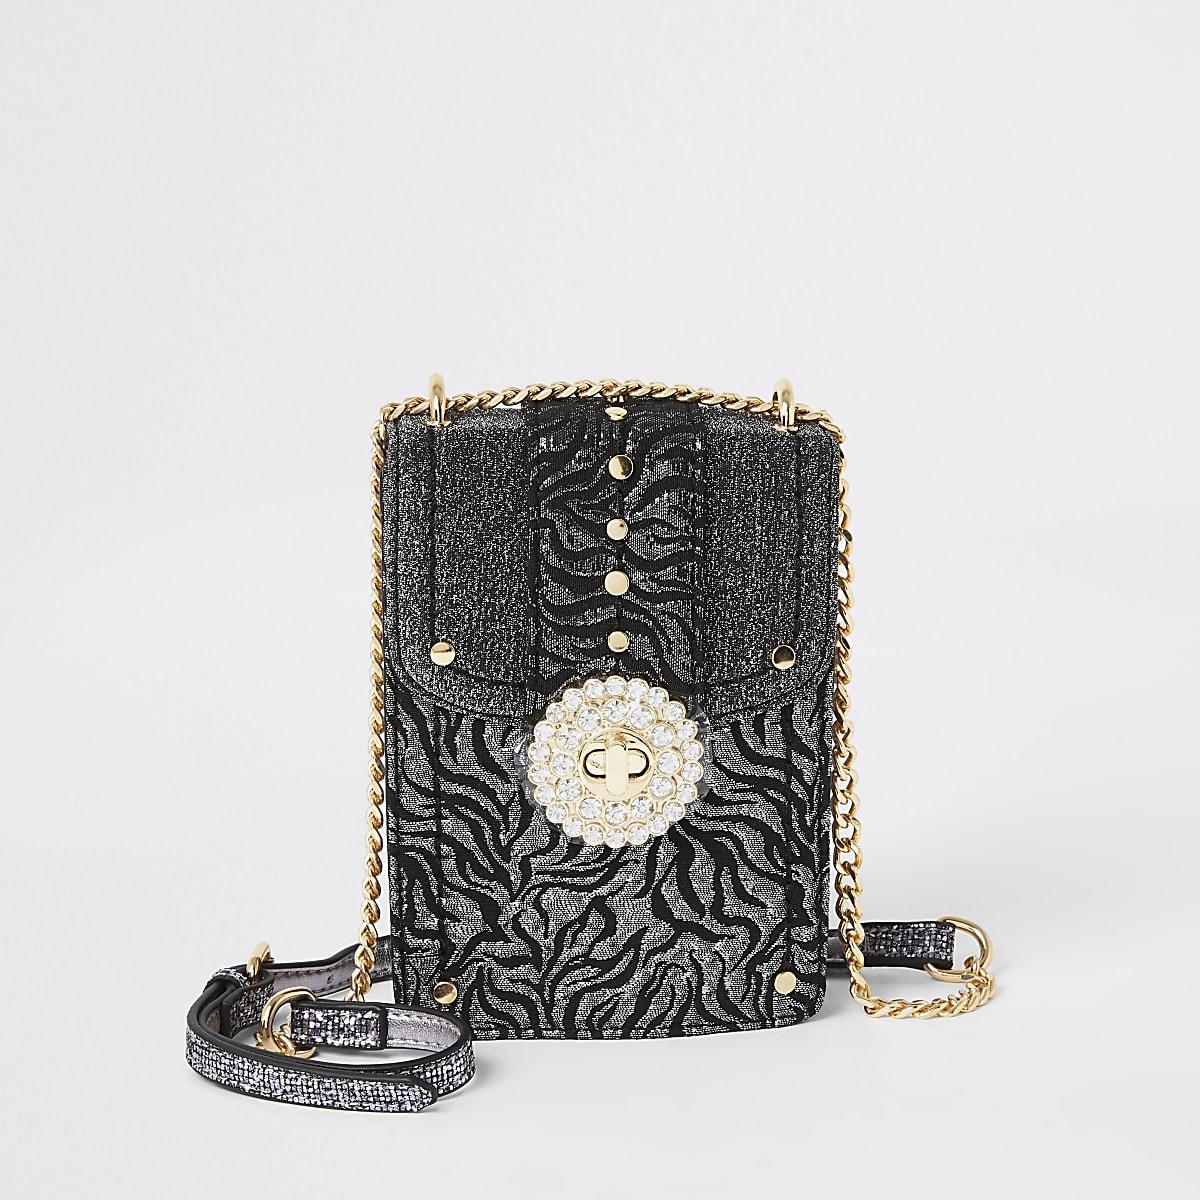 Silver jacquard embellished cross body bag